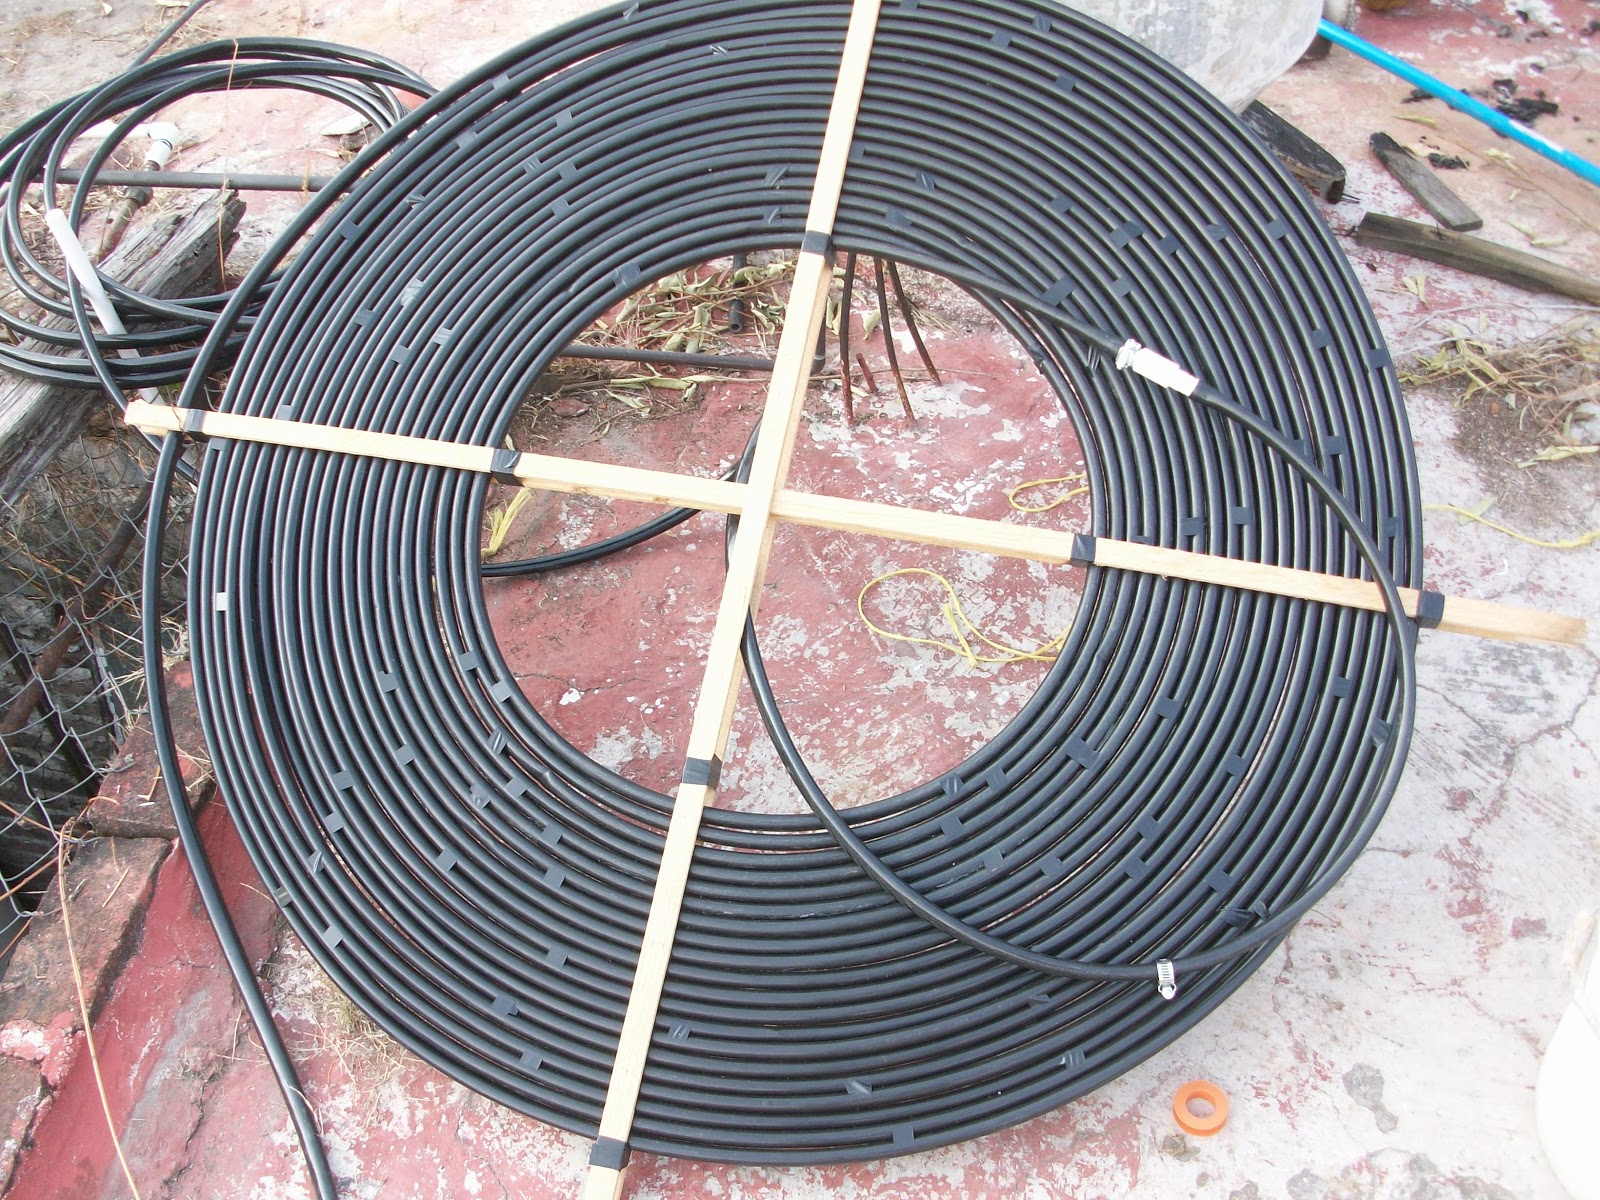 Bit cora del capit n calentador solar casero for Calentador solar piscina casero